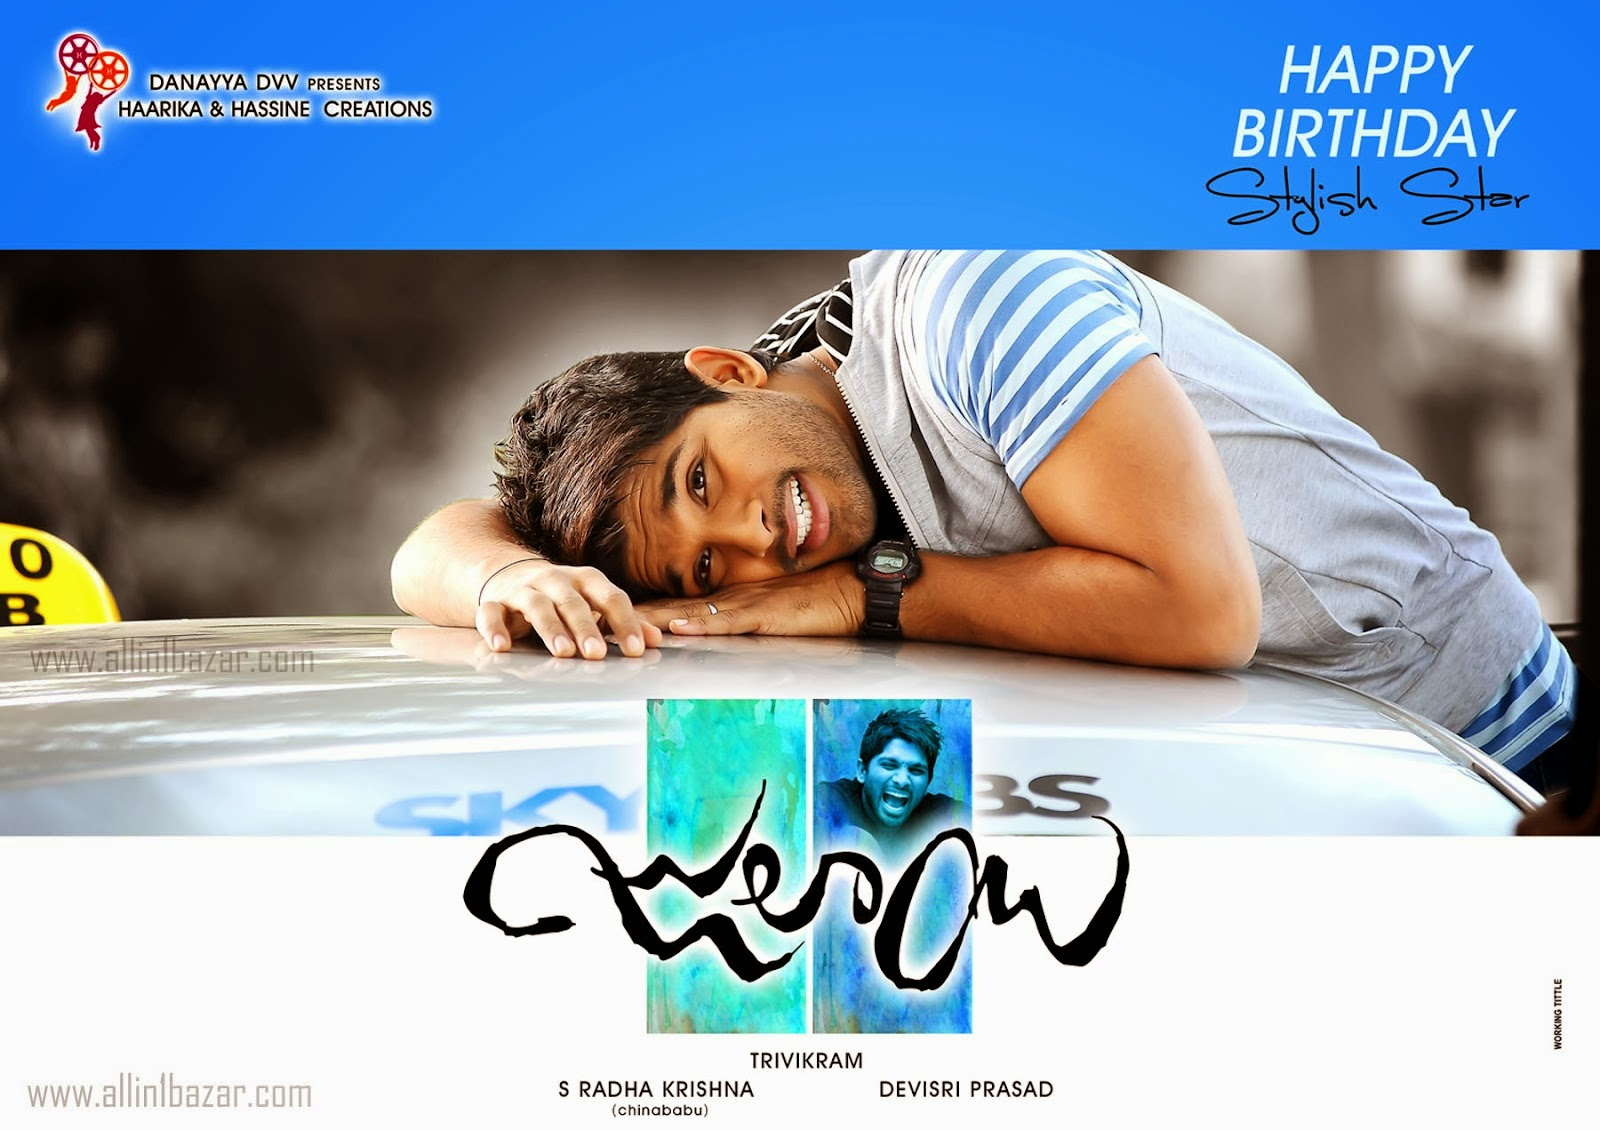 Buy Star stylish allu arjun movie list picture trends